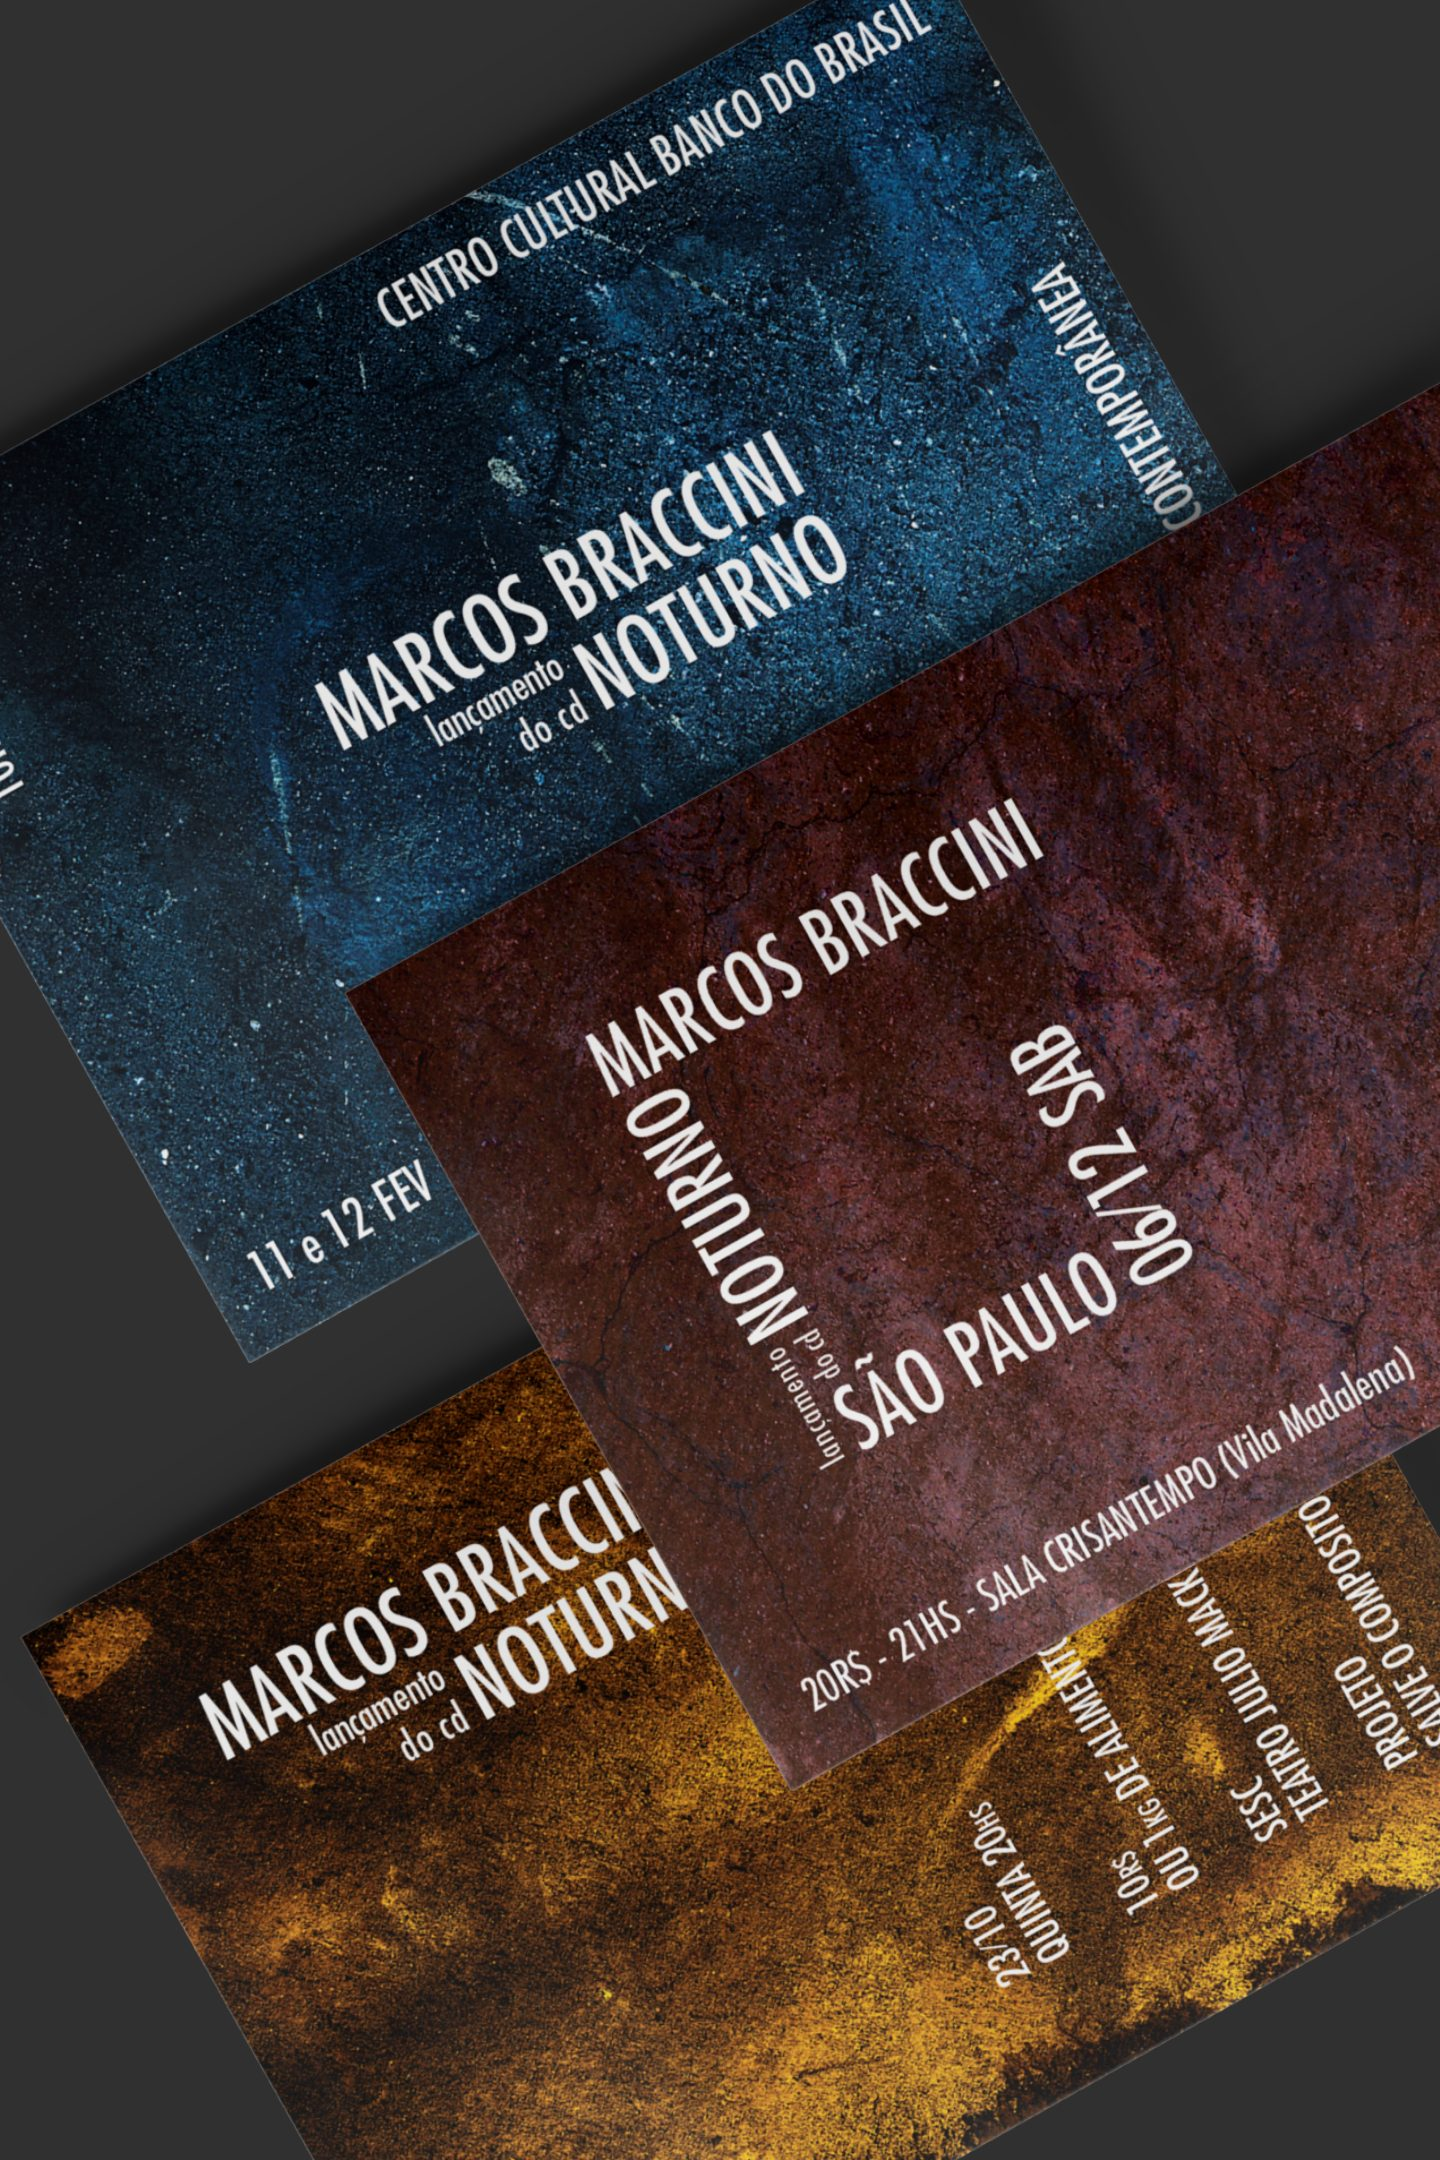 Noturno-Poster-Series-7